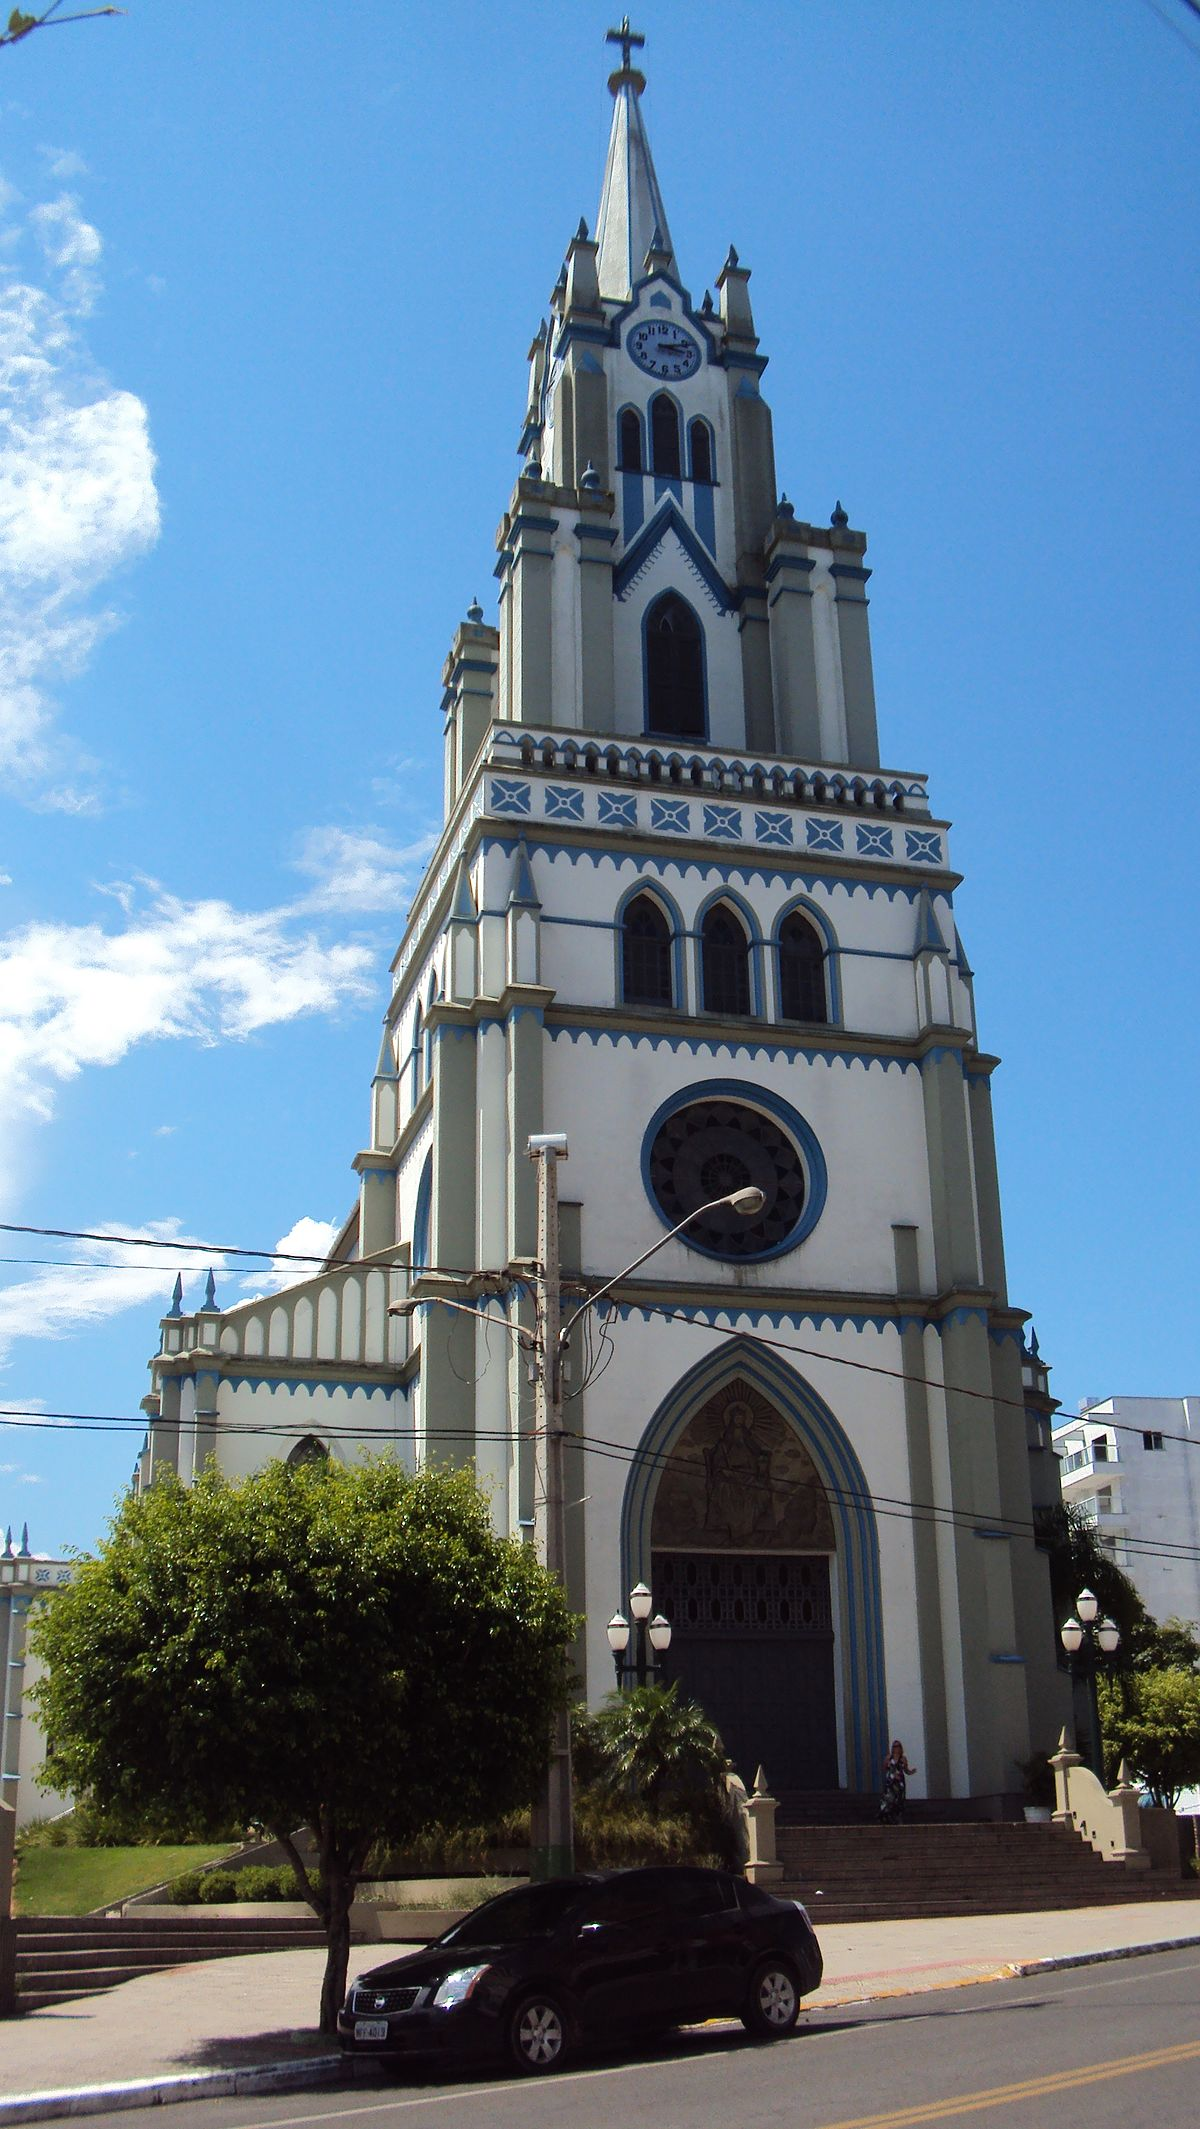 Orleans Santa Catarina fonte: upload.wikimedia.org